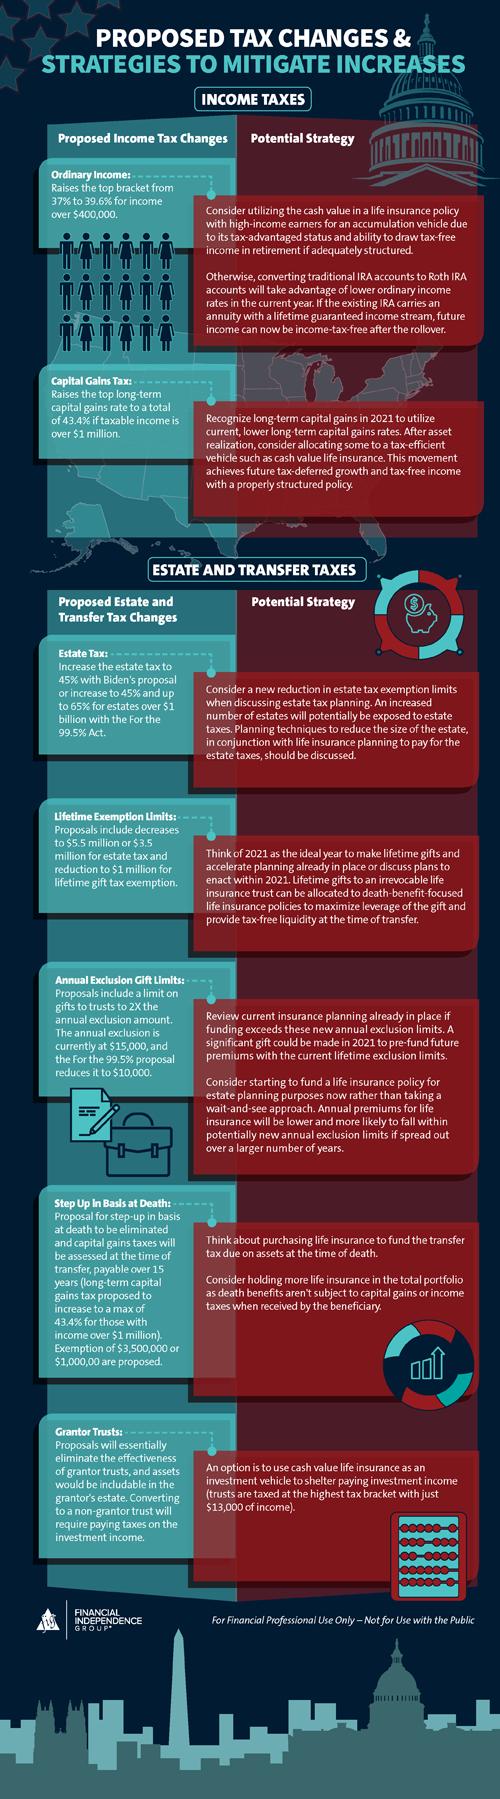 overview of biden's legislative tax proposals